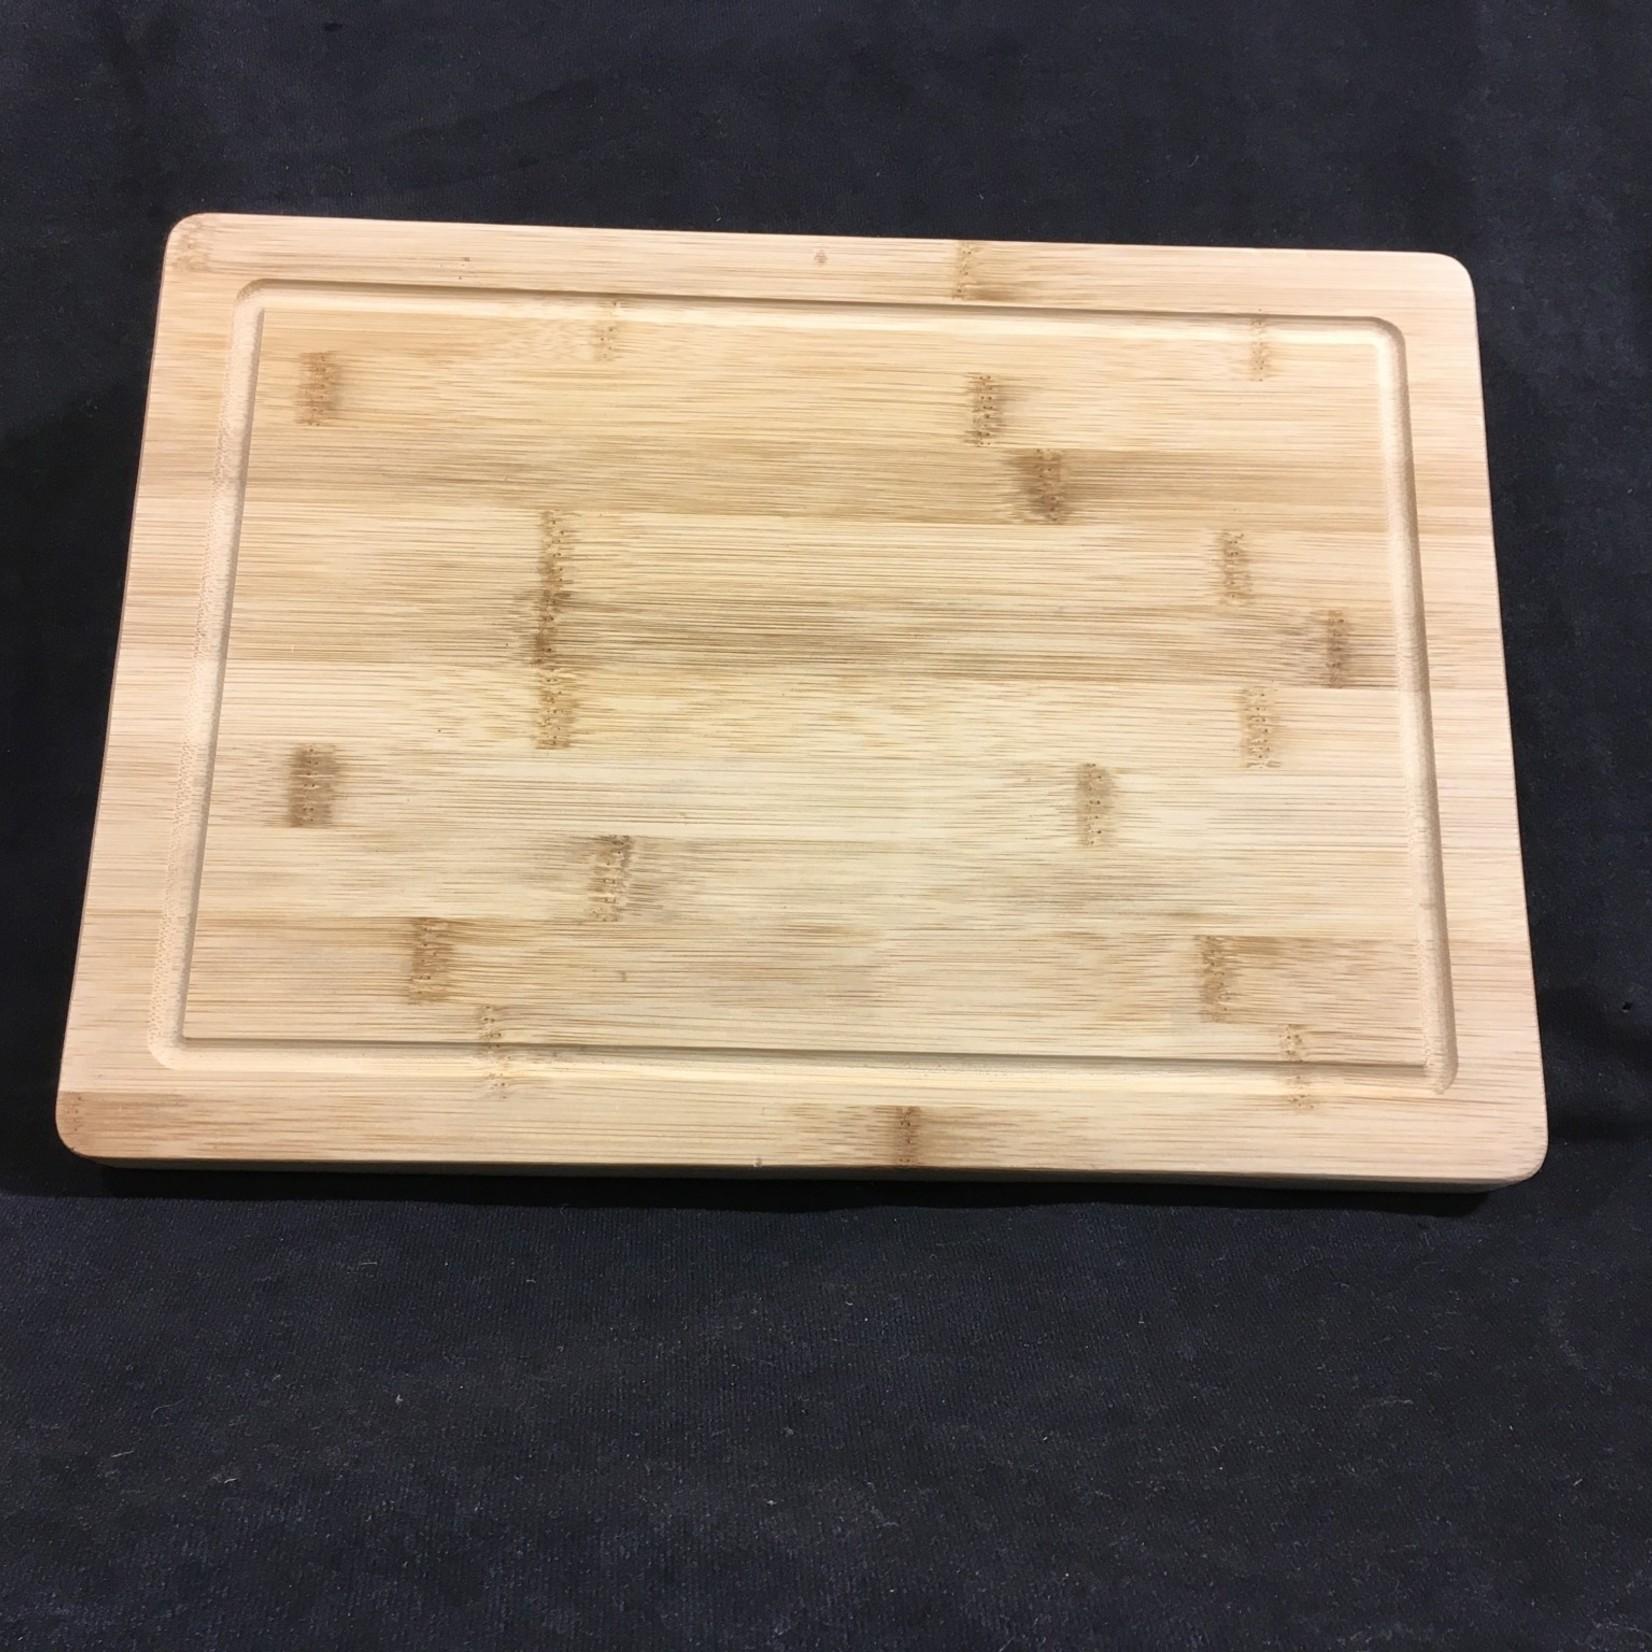 Grooved Bamboo Cutting Board 9.75x13.75